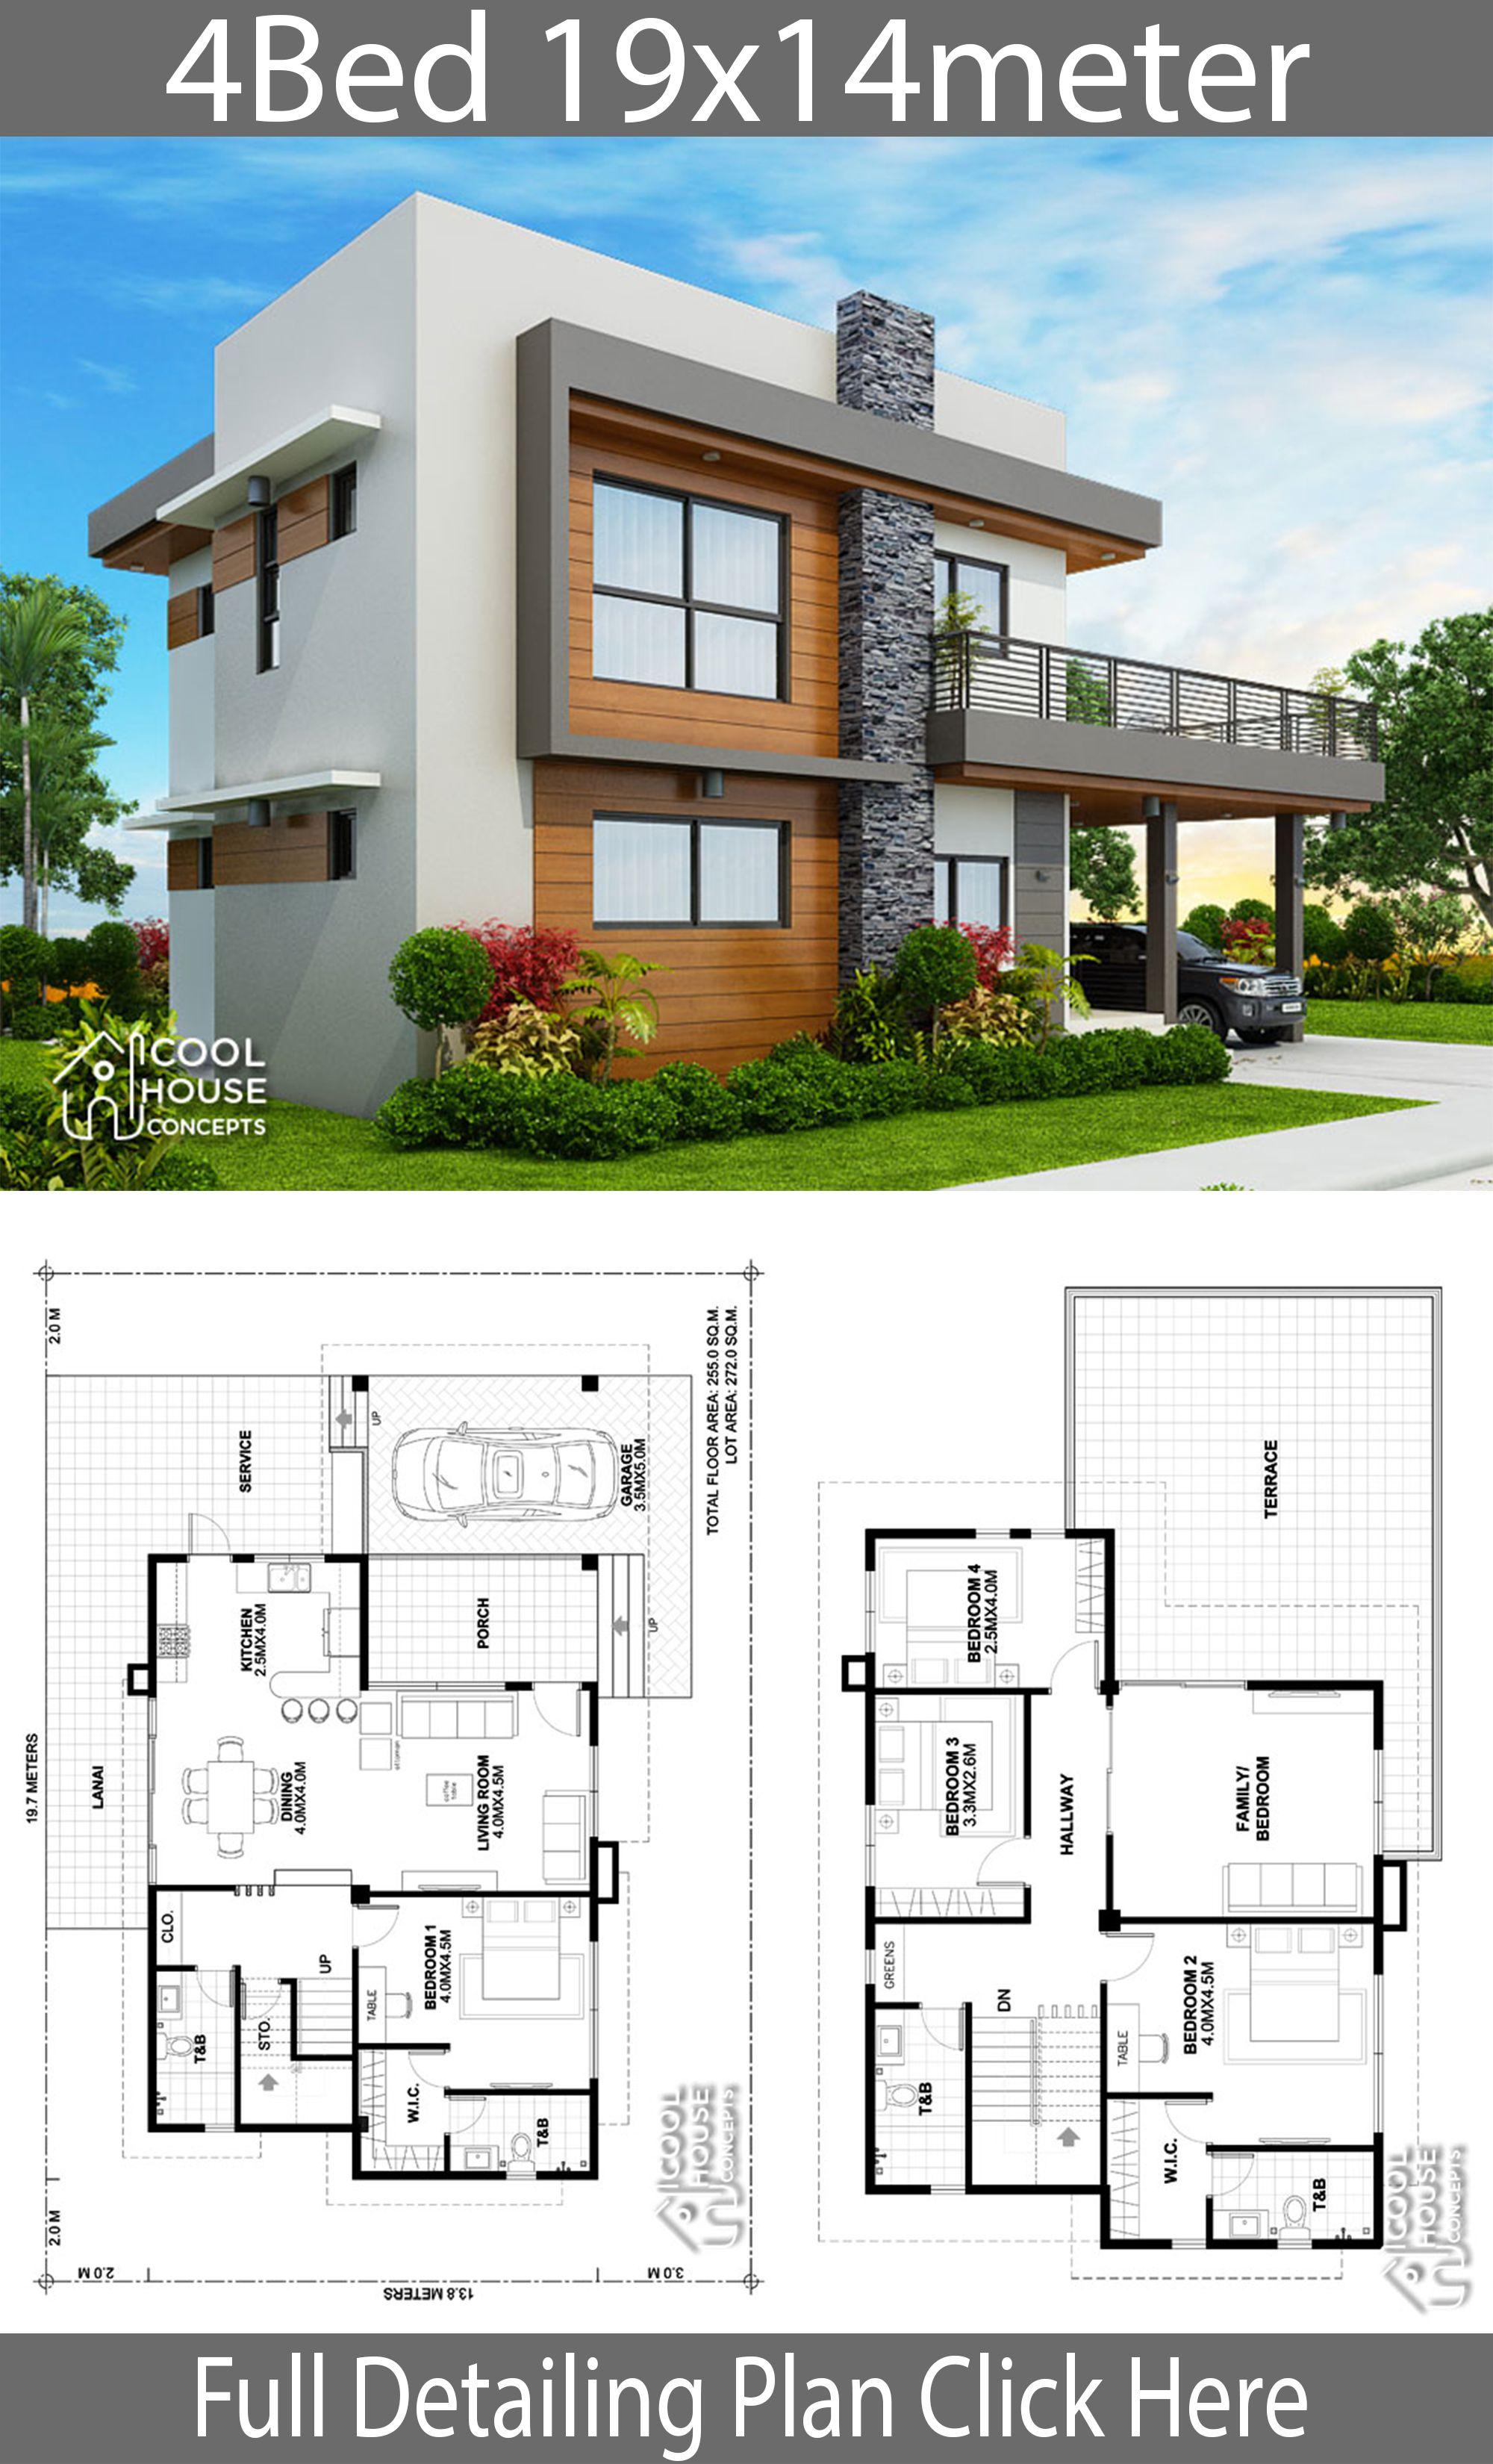 Modern House Plans 13x14m And 19x14m Plan Architecture Maison Architecture De Maison Maison Architecte Moderne